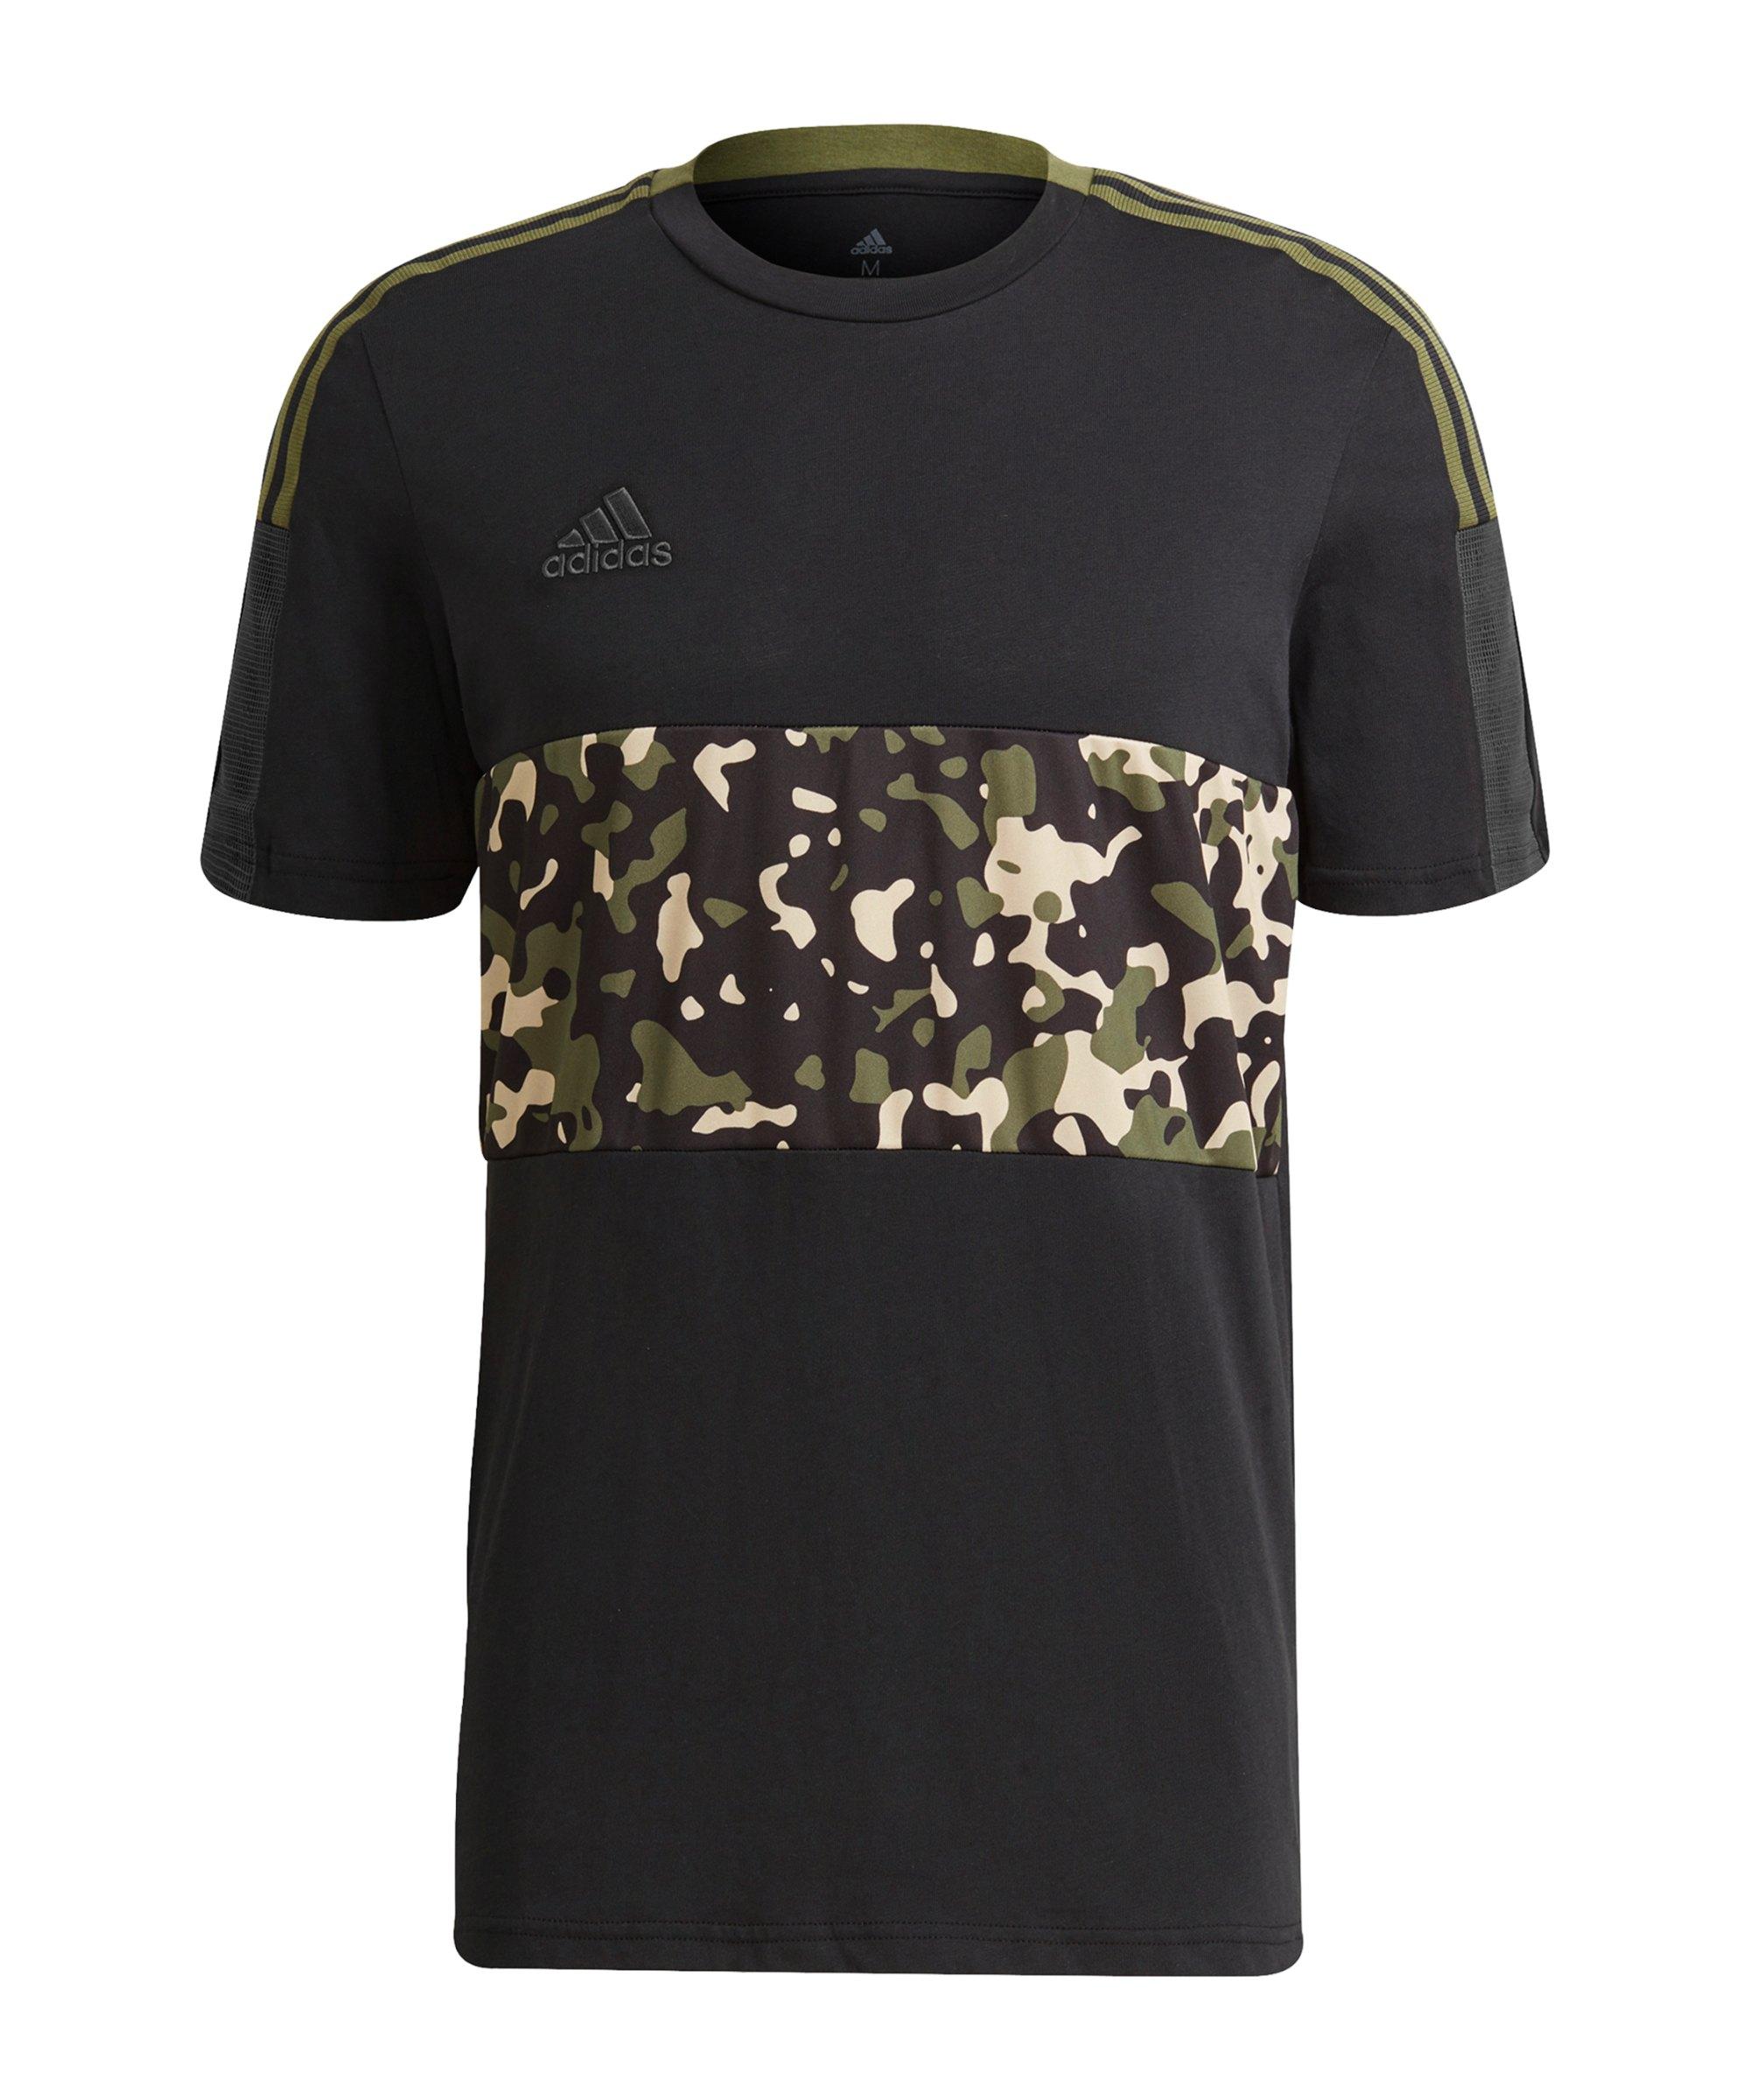 adidas Tiro AOP T-Shirt Schwarz - schwarz